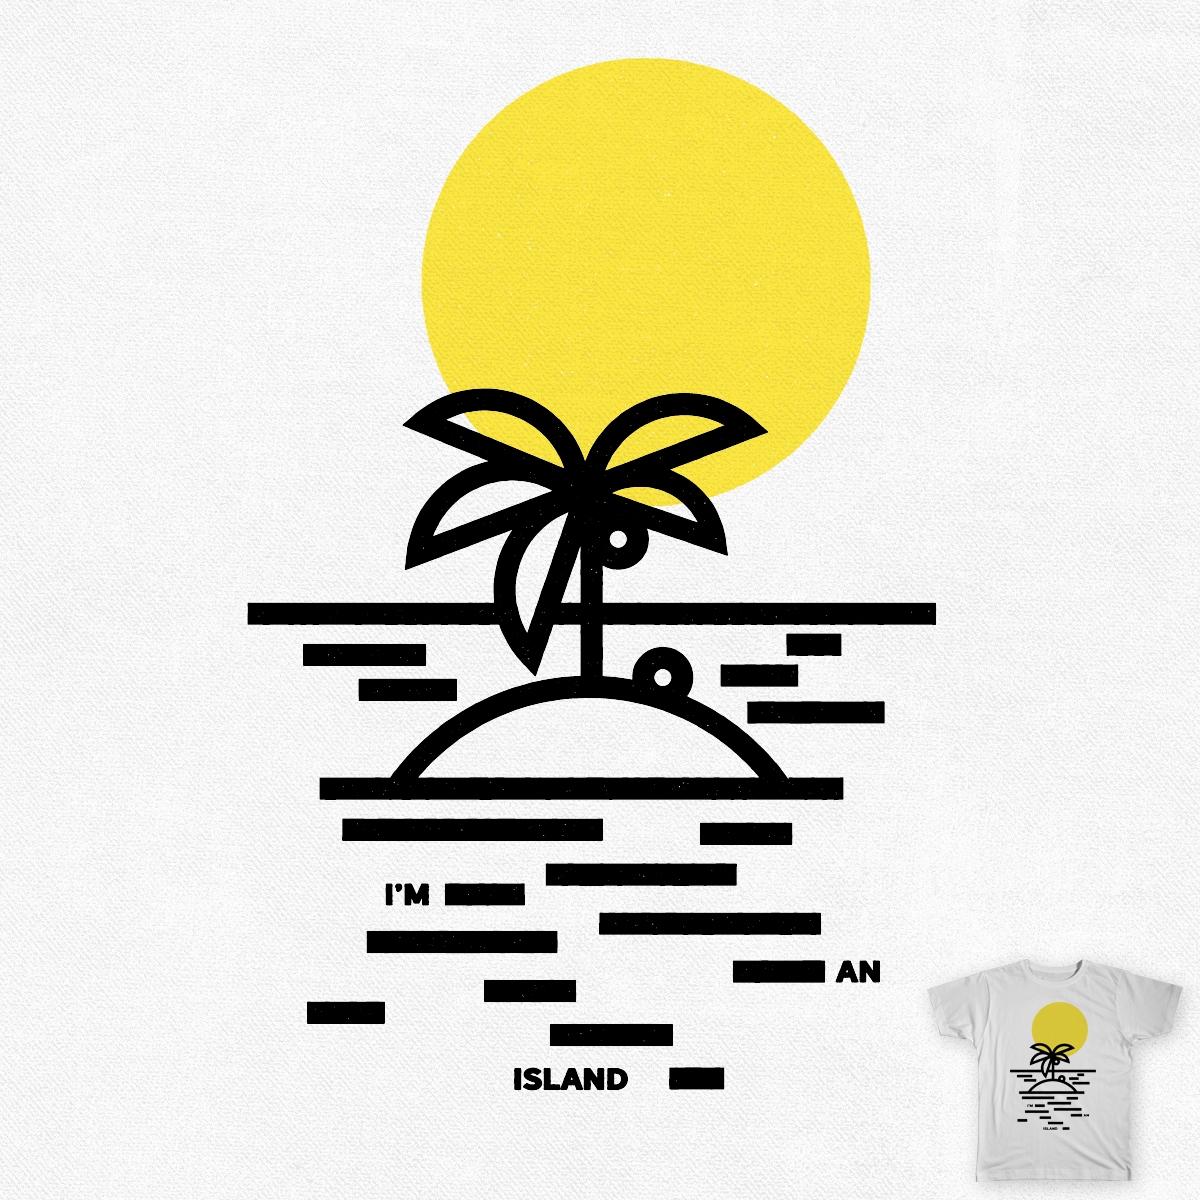 entry challenge - island - Threadless - gintron | ello